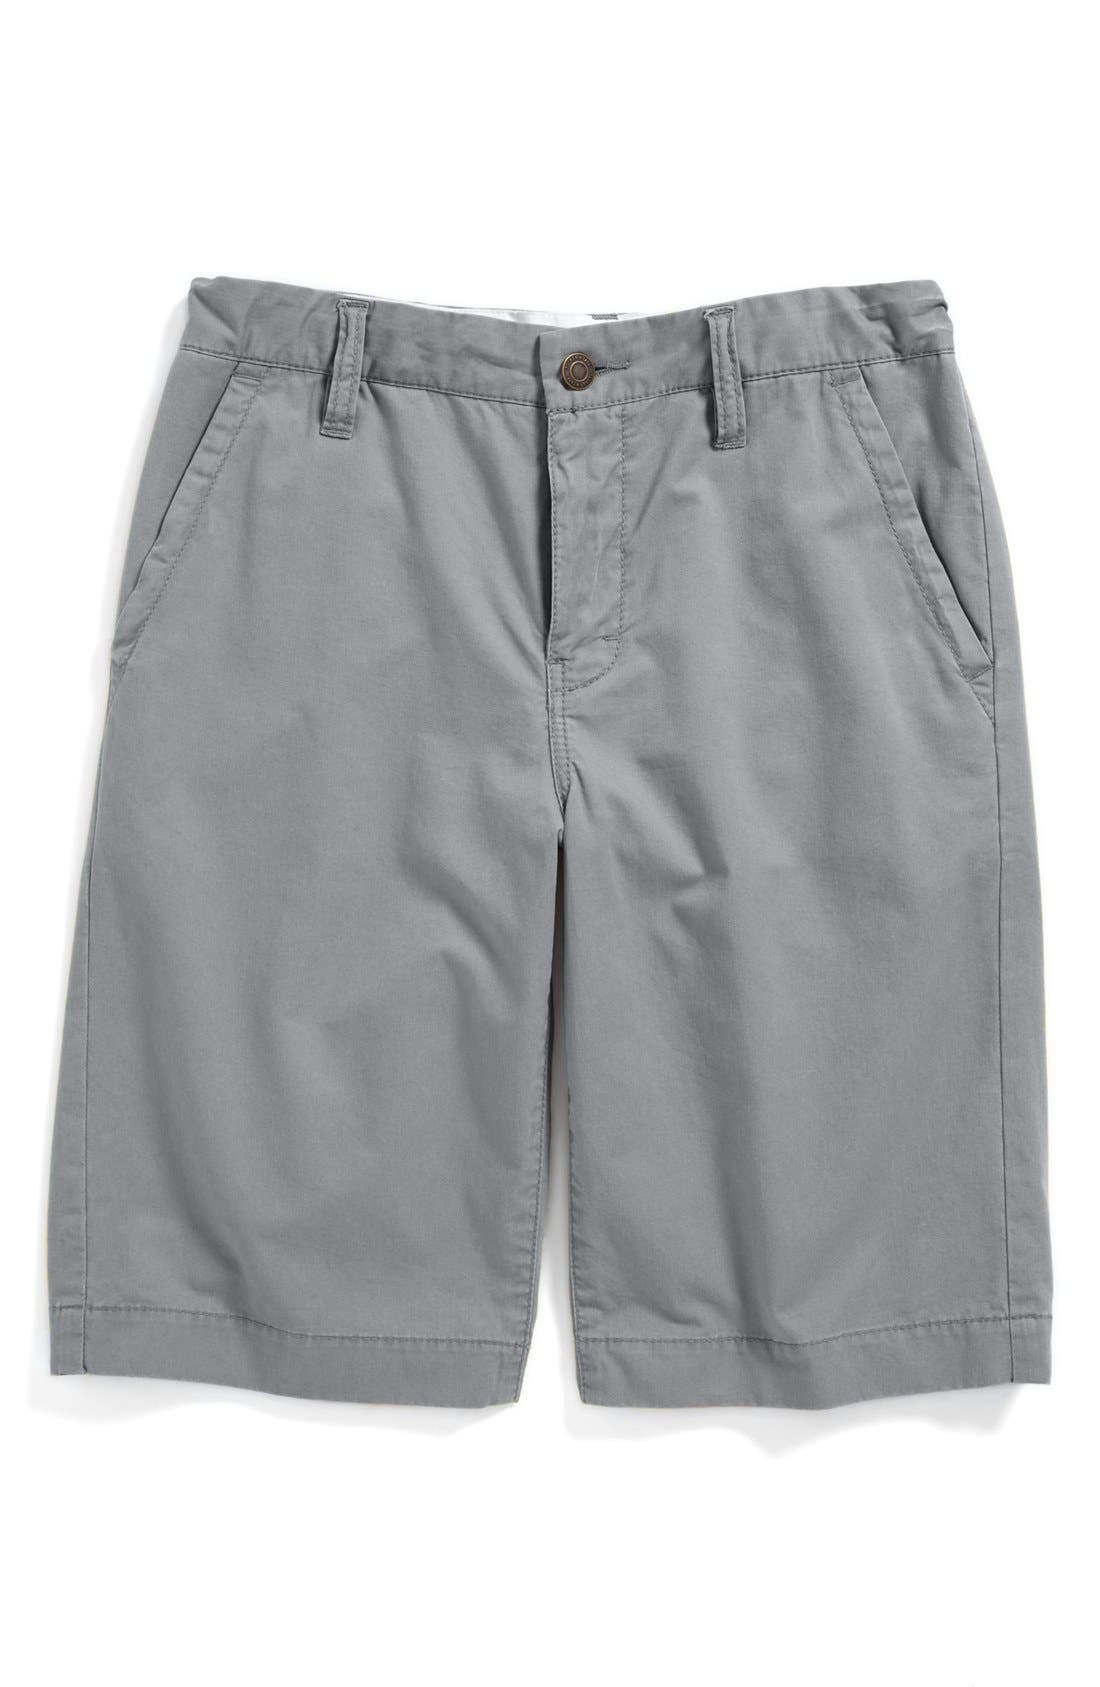 Main Image - Tucker + Tate 'Stunt' Chino Shorts (Toddler Boys, Little Boys & Big Boys)